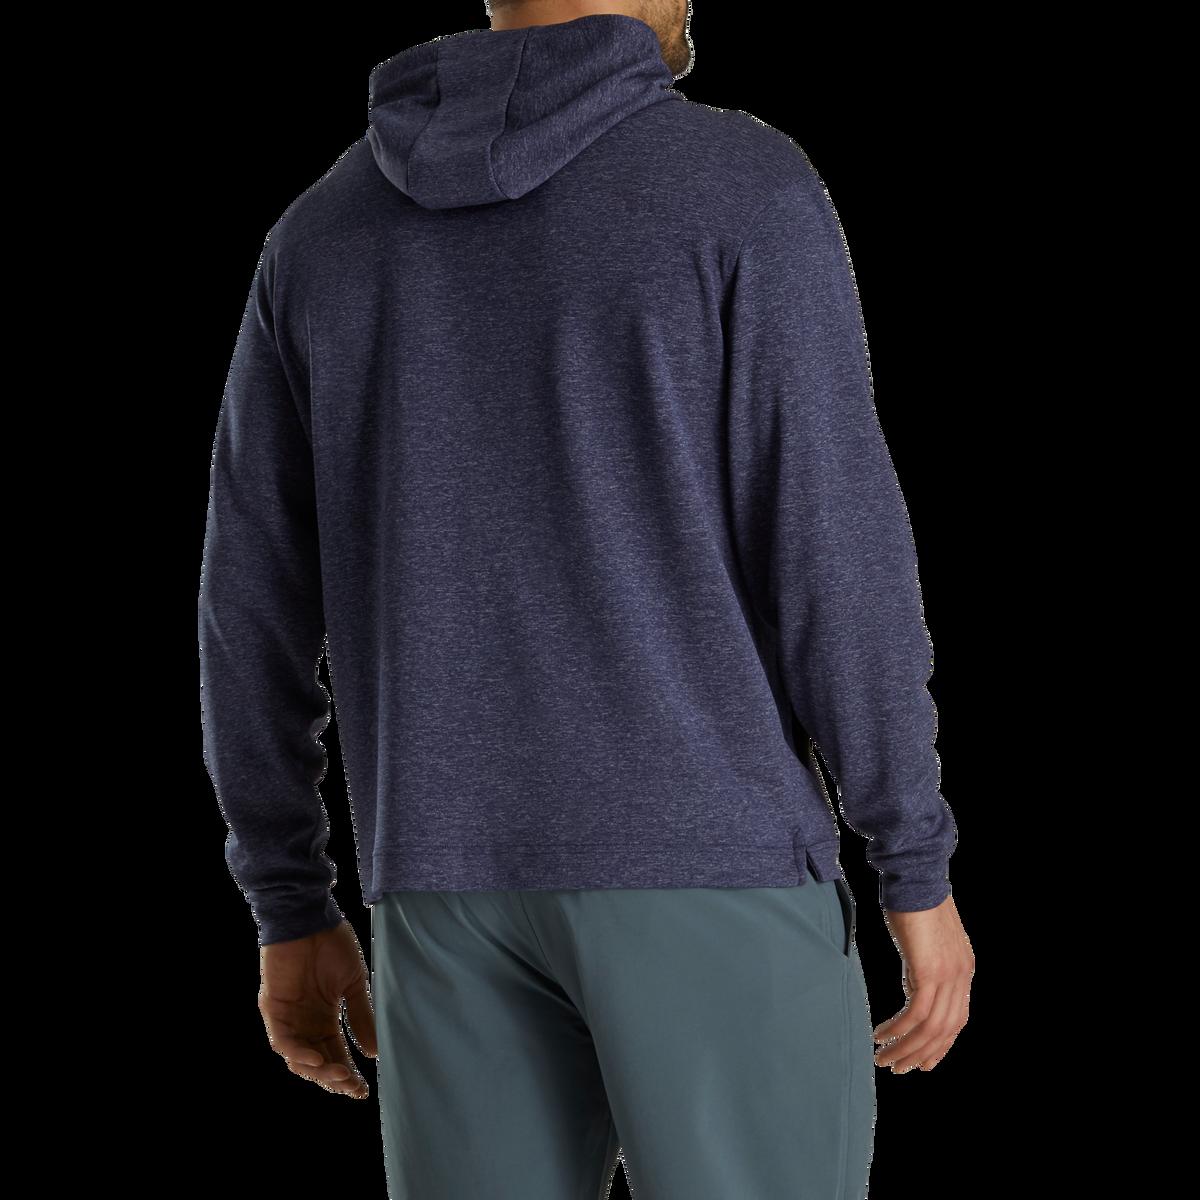 2021 U.S. Open Lightweight Jersey Hoodie